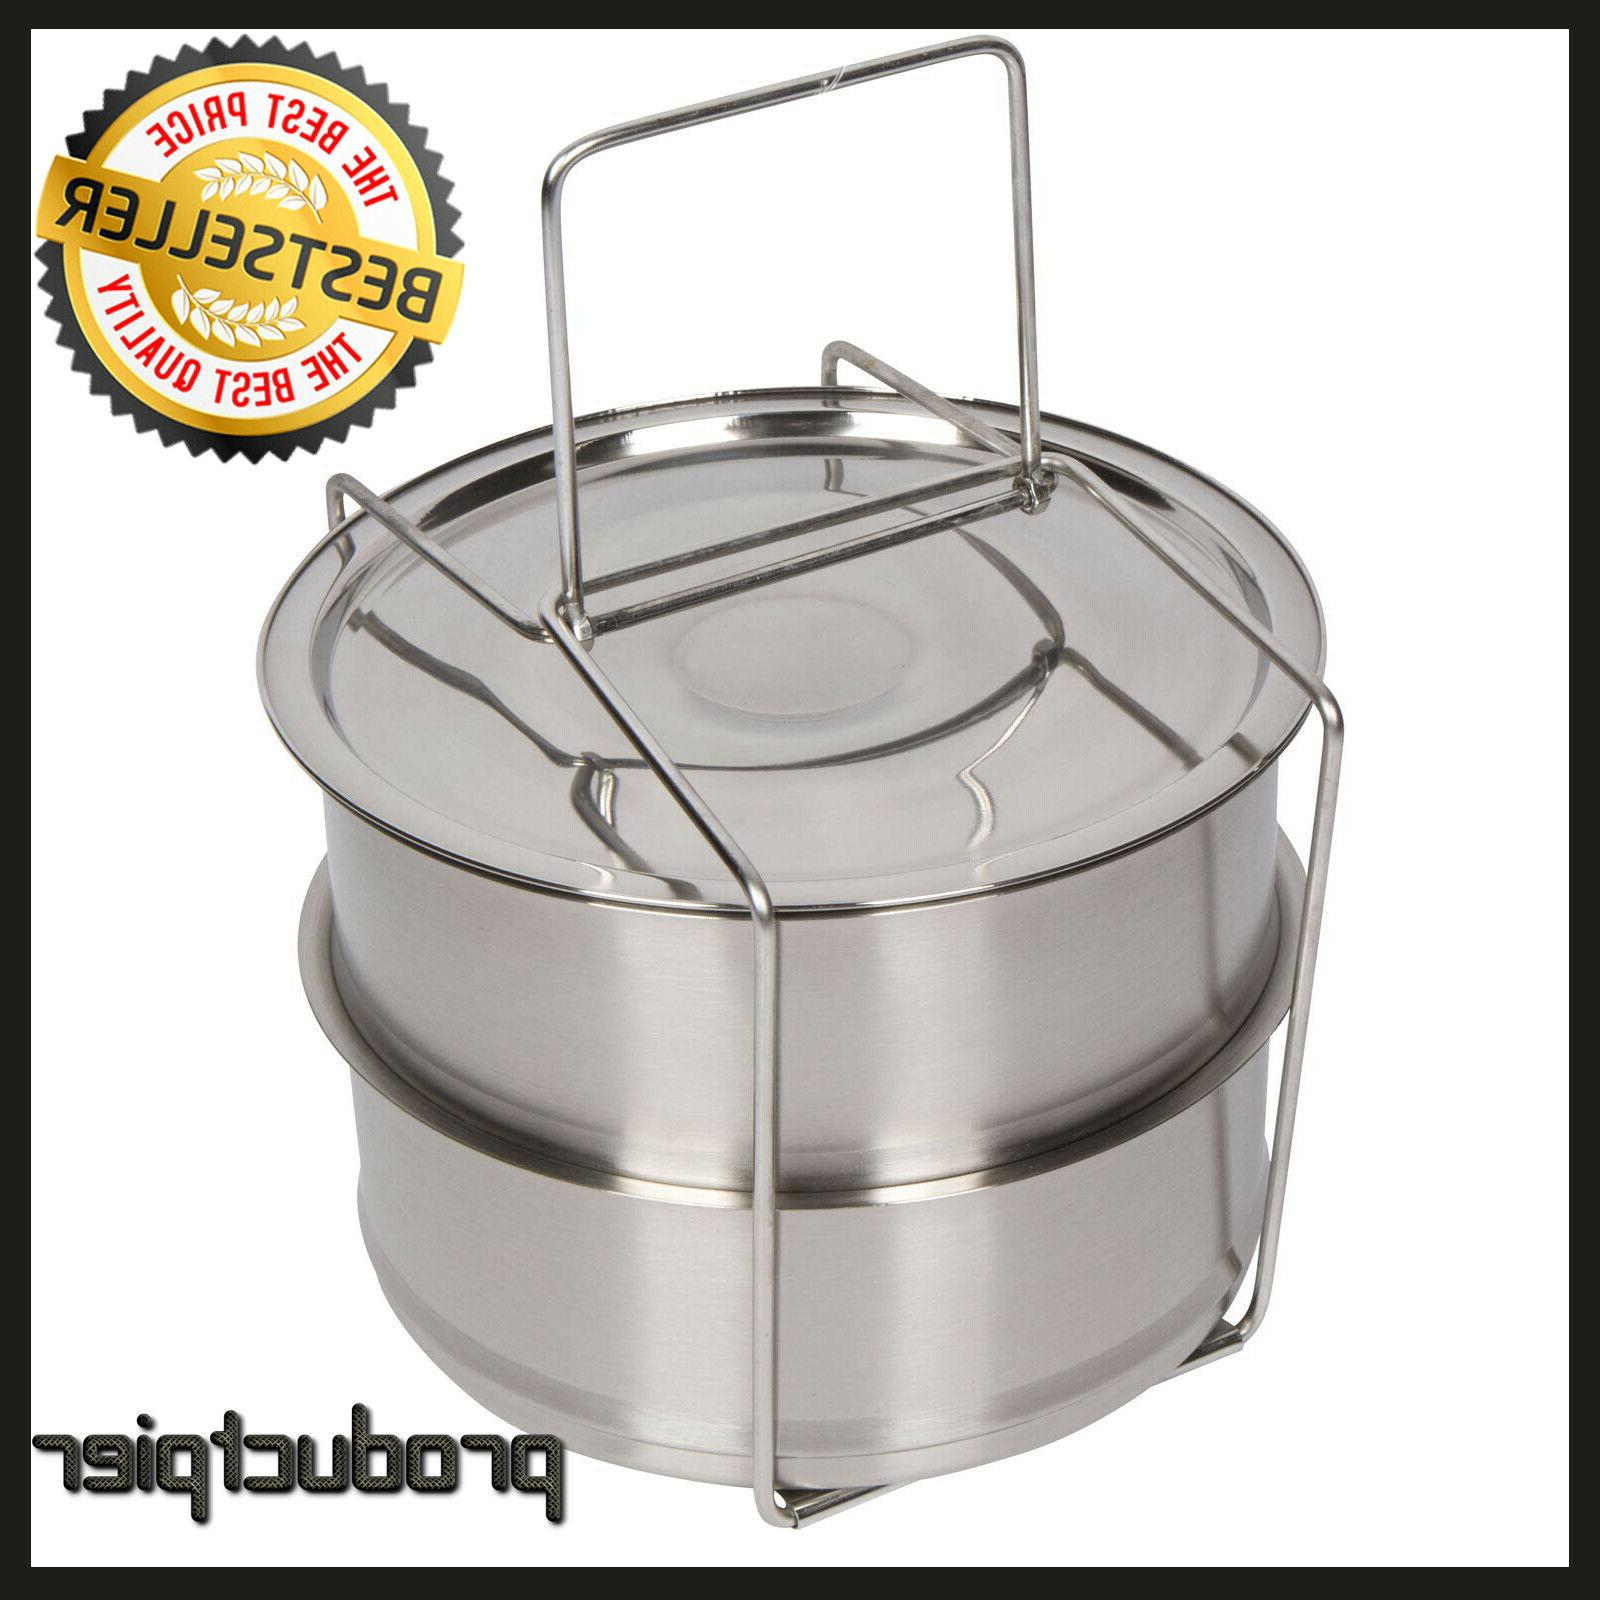 stainless steel steamer 6 8qt pressure cooker